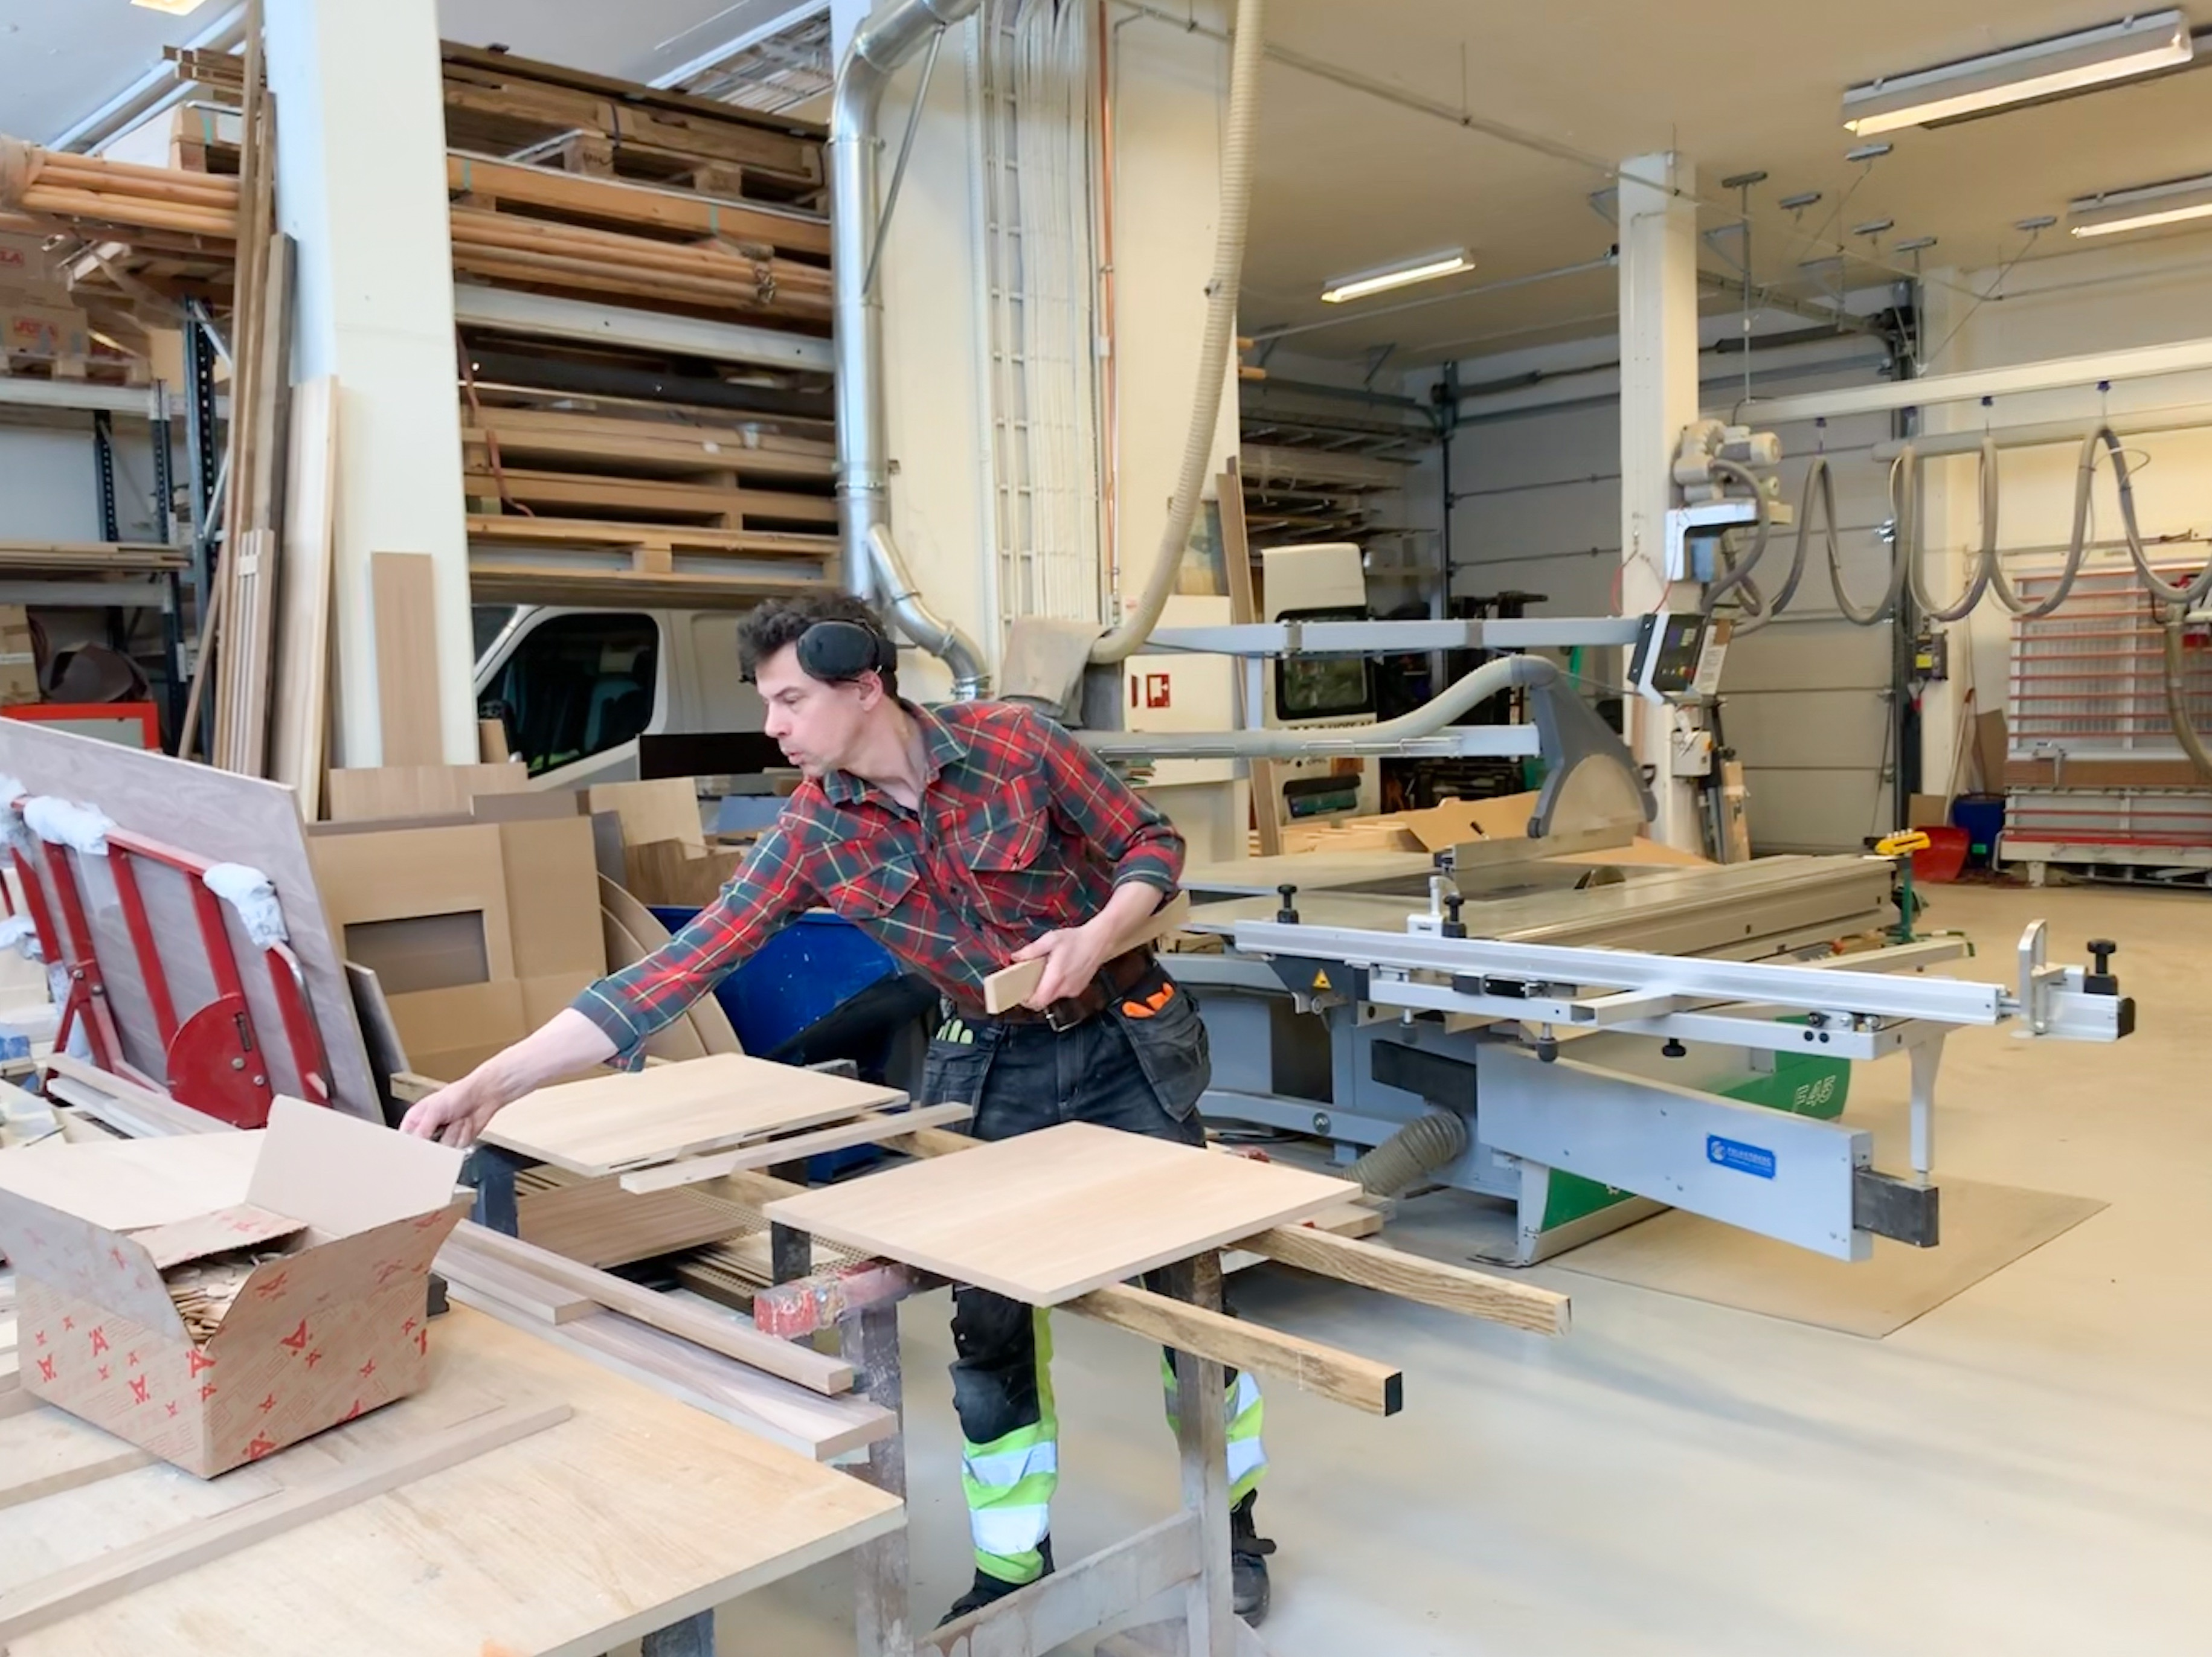 wood-eikefiner-kjokkenfront